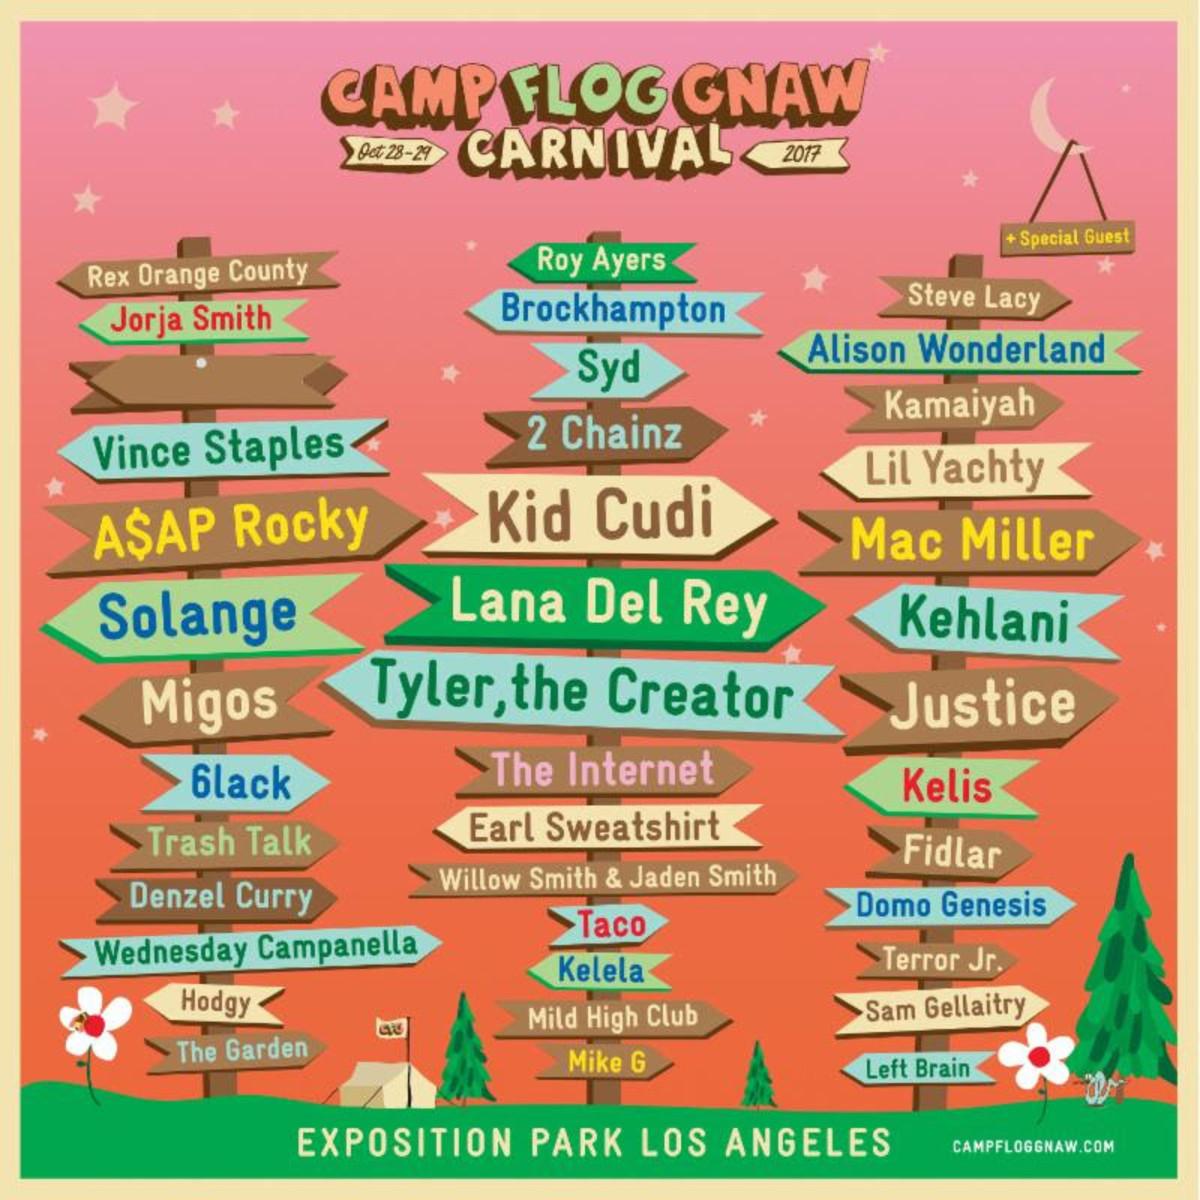 Camp Flog Gnaw Carnival 2017 Lineup